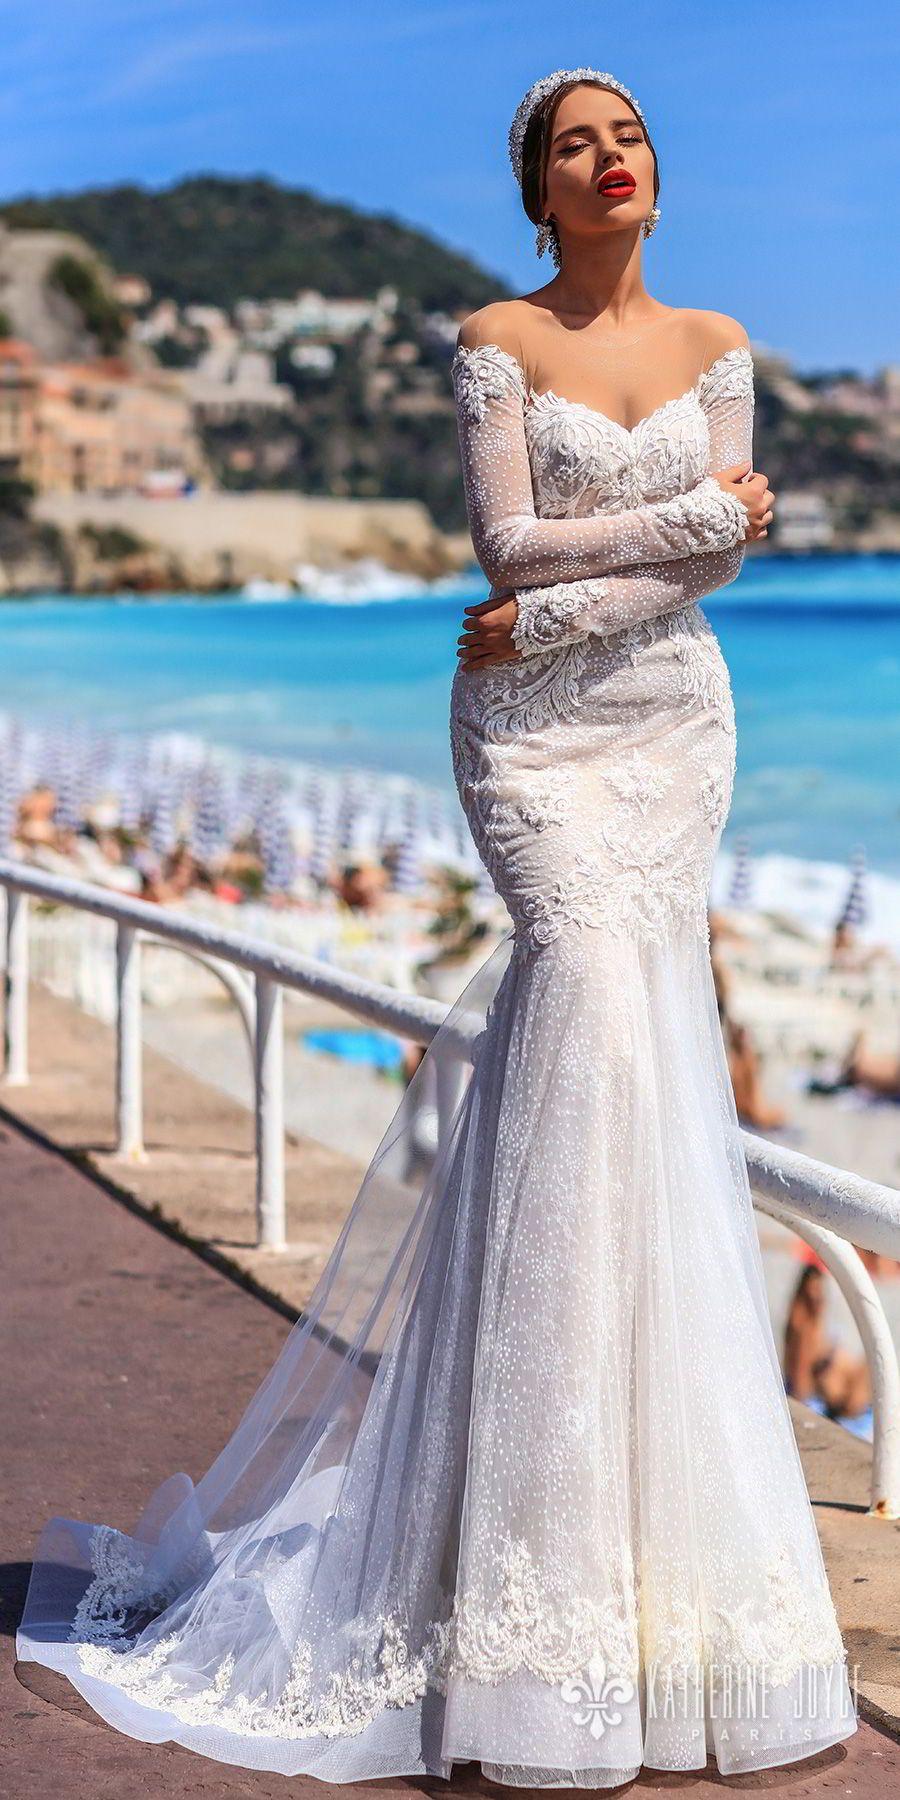 Katherine Joyce 2018 Wedding Dresses Ma Cherie Bridal Collection Wedding Inspirasi Lace Mermaid Wedding Dress Wedding Dresses Romantic Wedding Dresses Lace [ 1800 x 900 Pixel ]